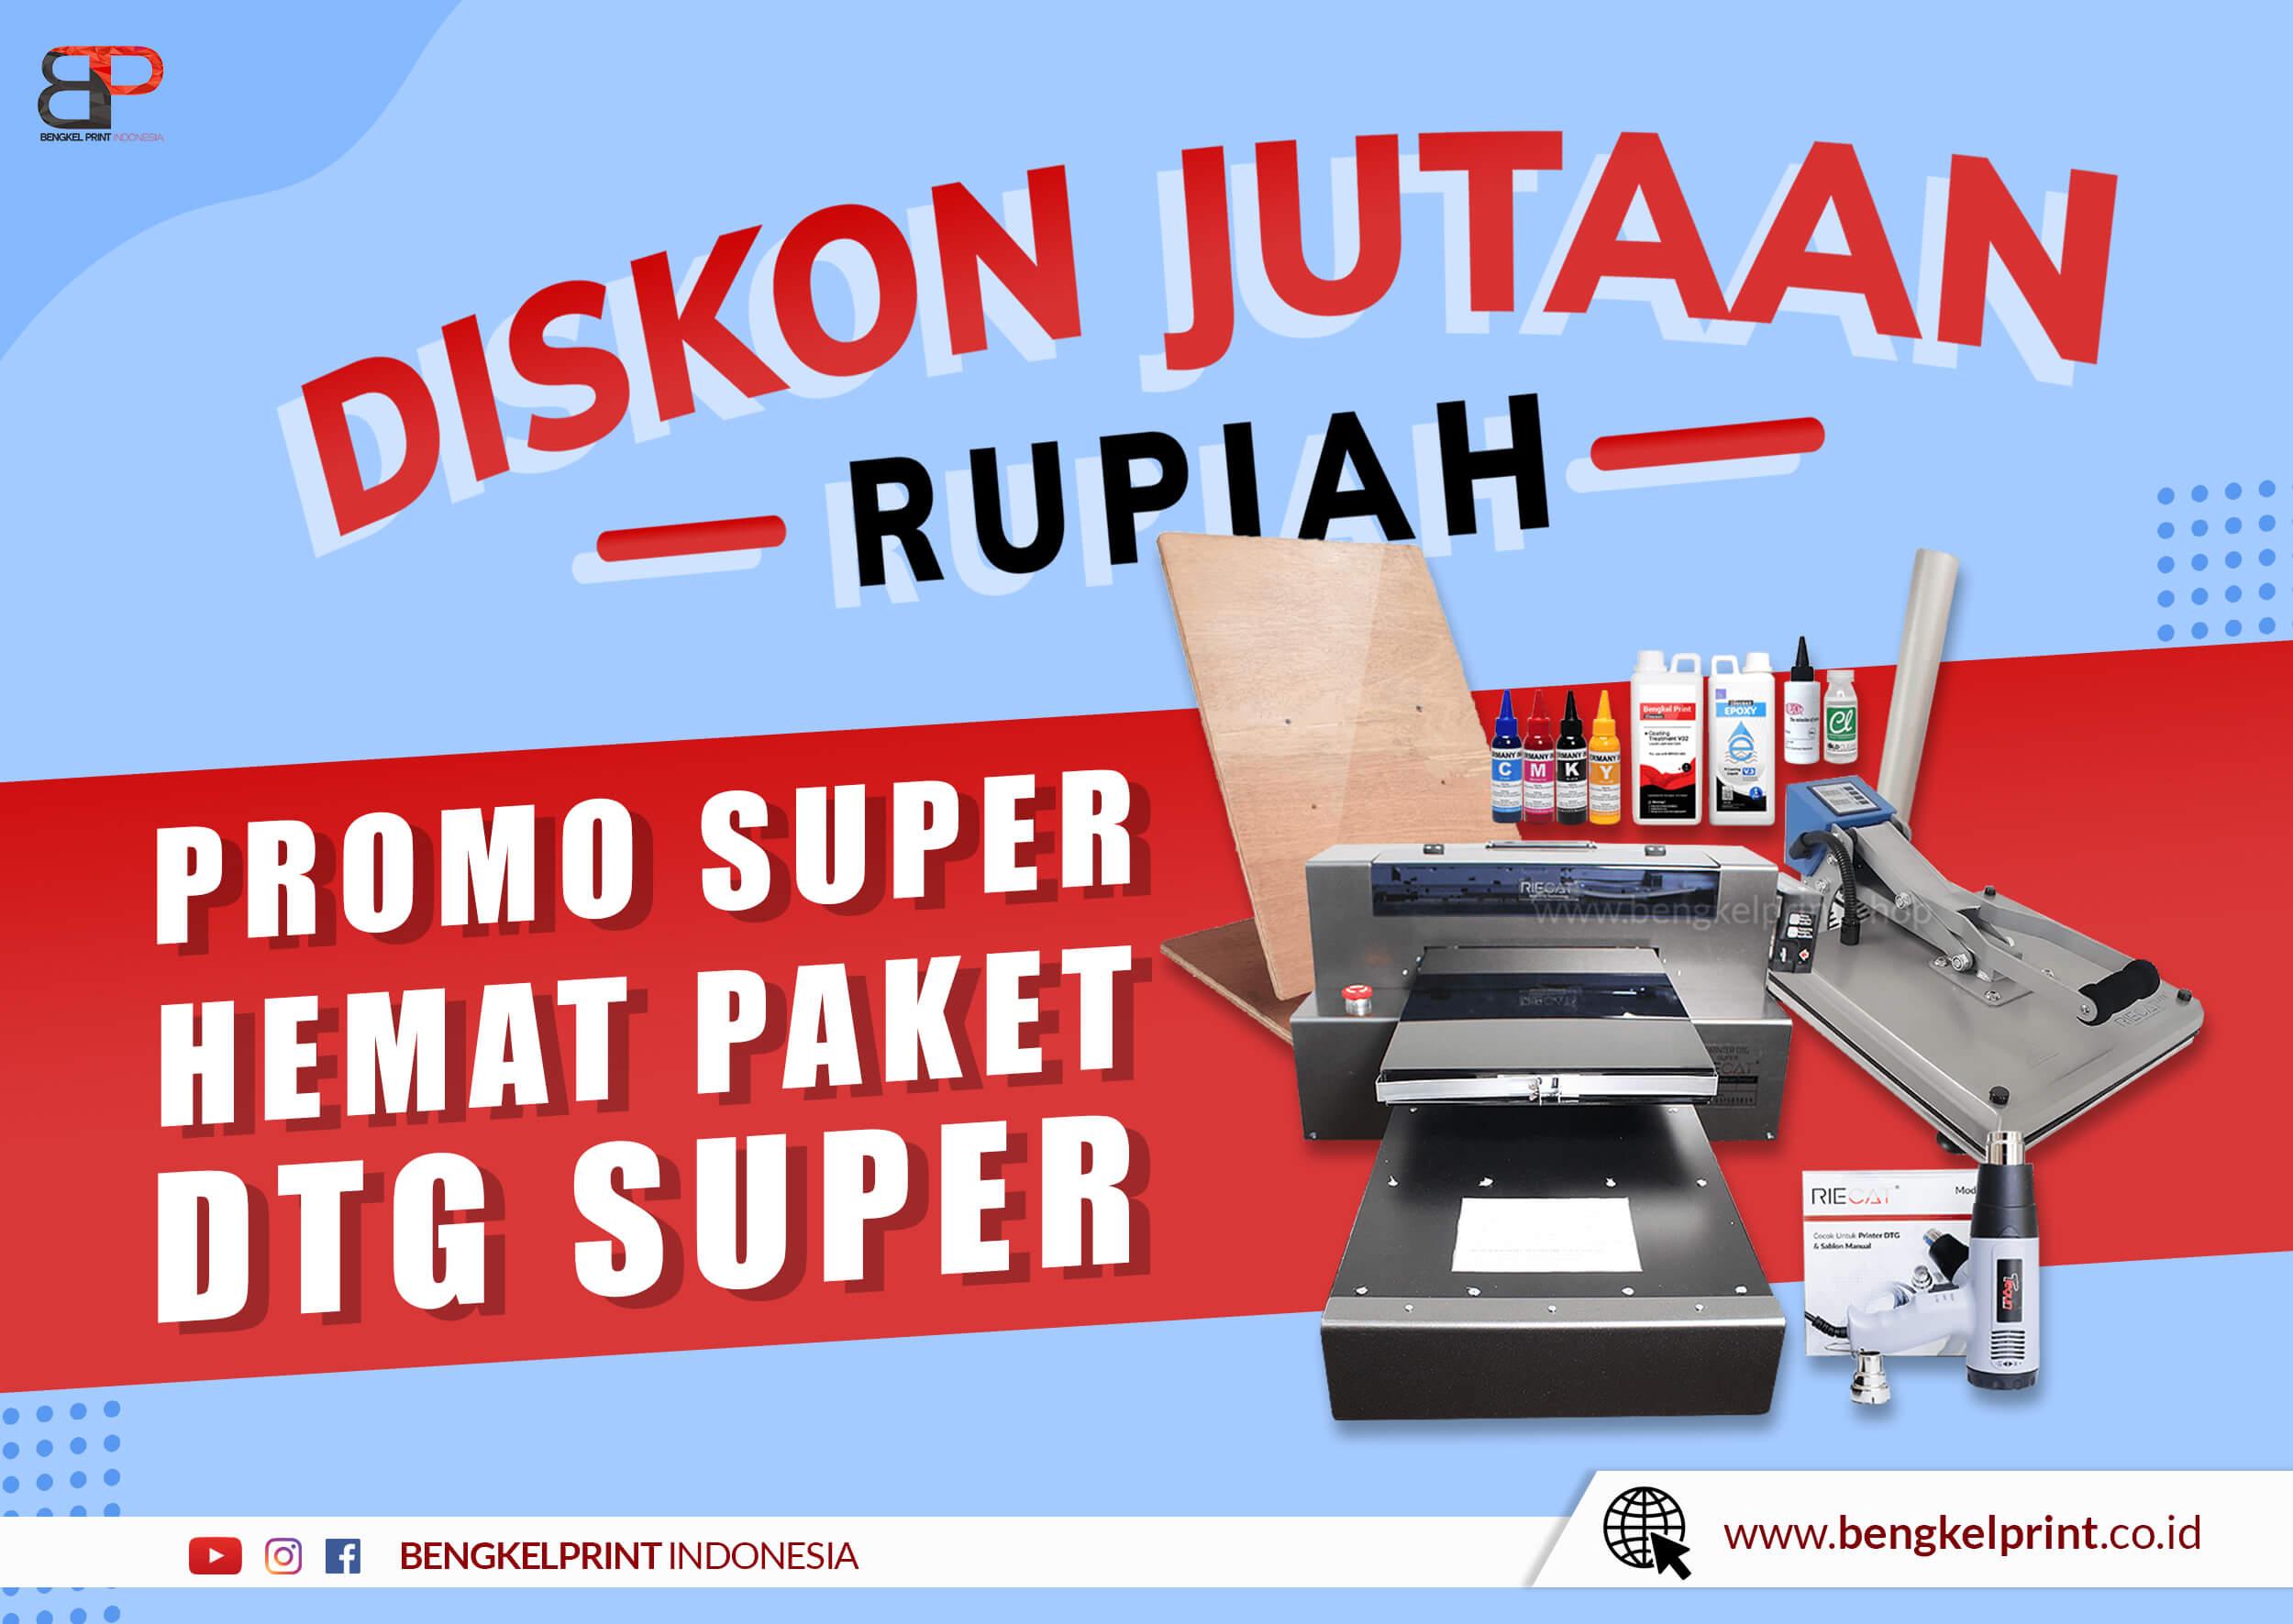 paket dtg a3 super murah 2021